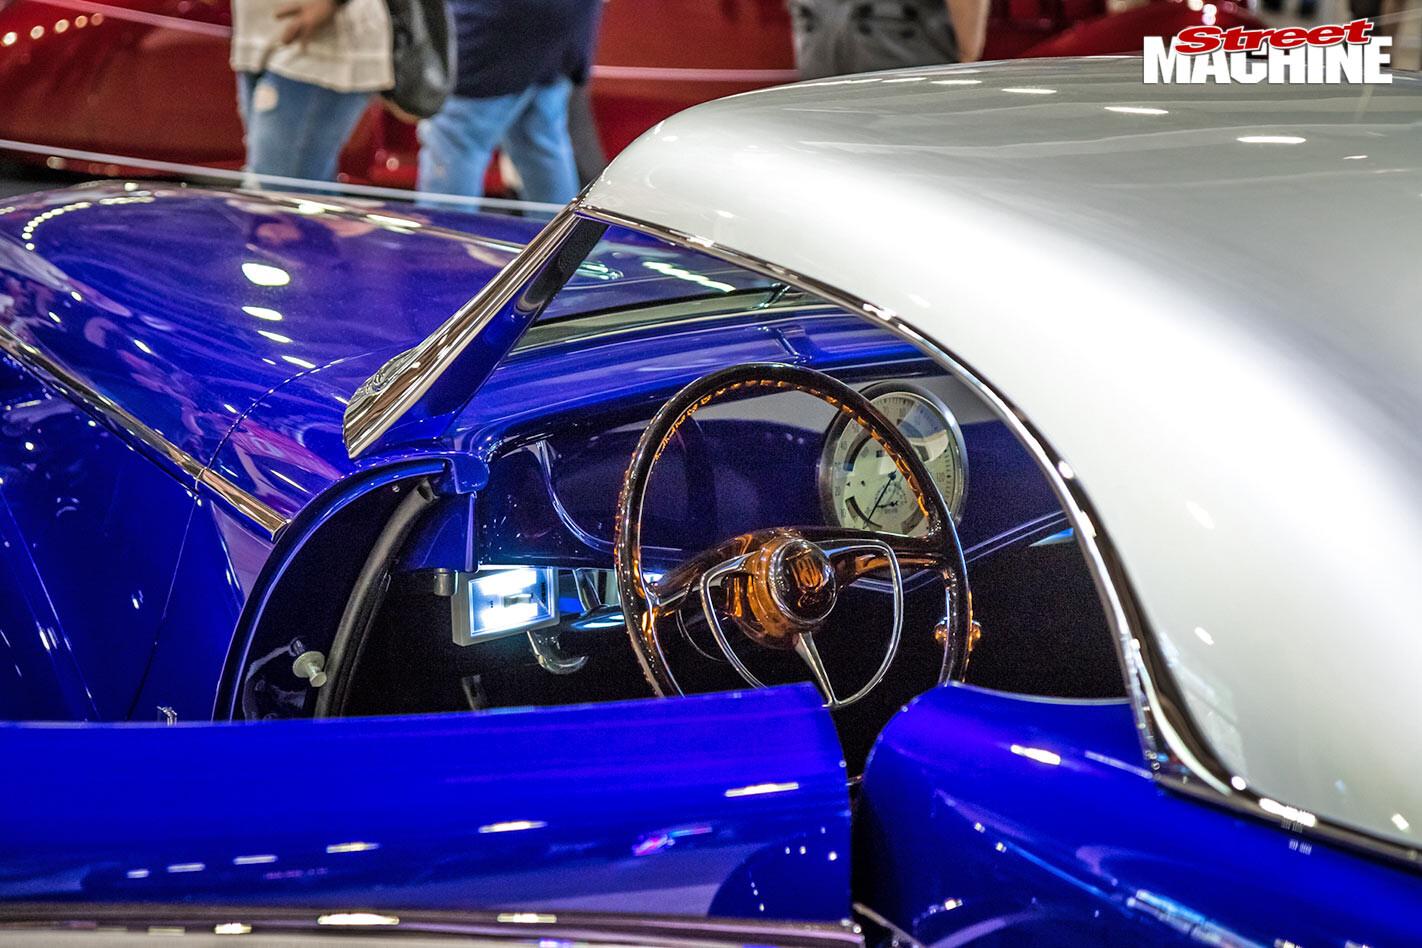 Rick Dore's Shangri La roadster